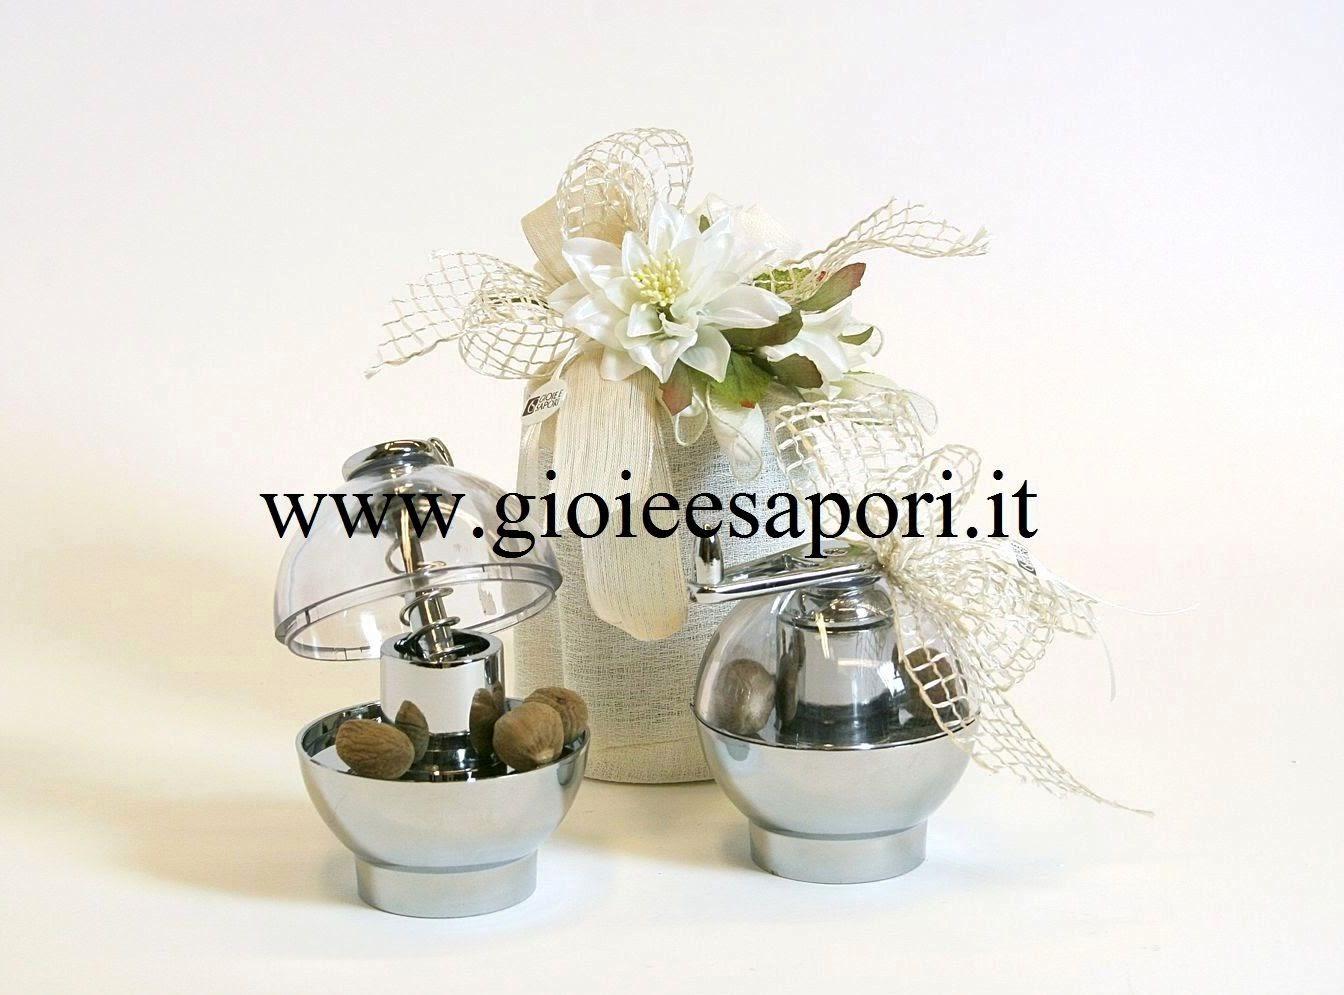 Super Matrimonio Moderno - Il Wedding blog per Spose moderne e Sposi 2.0  OC41